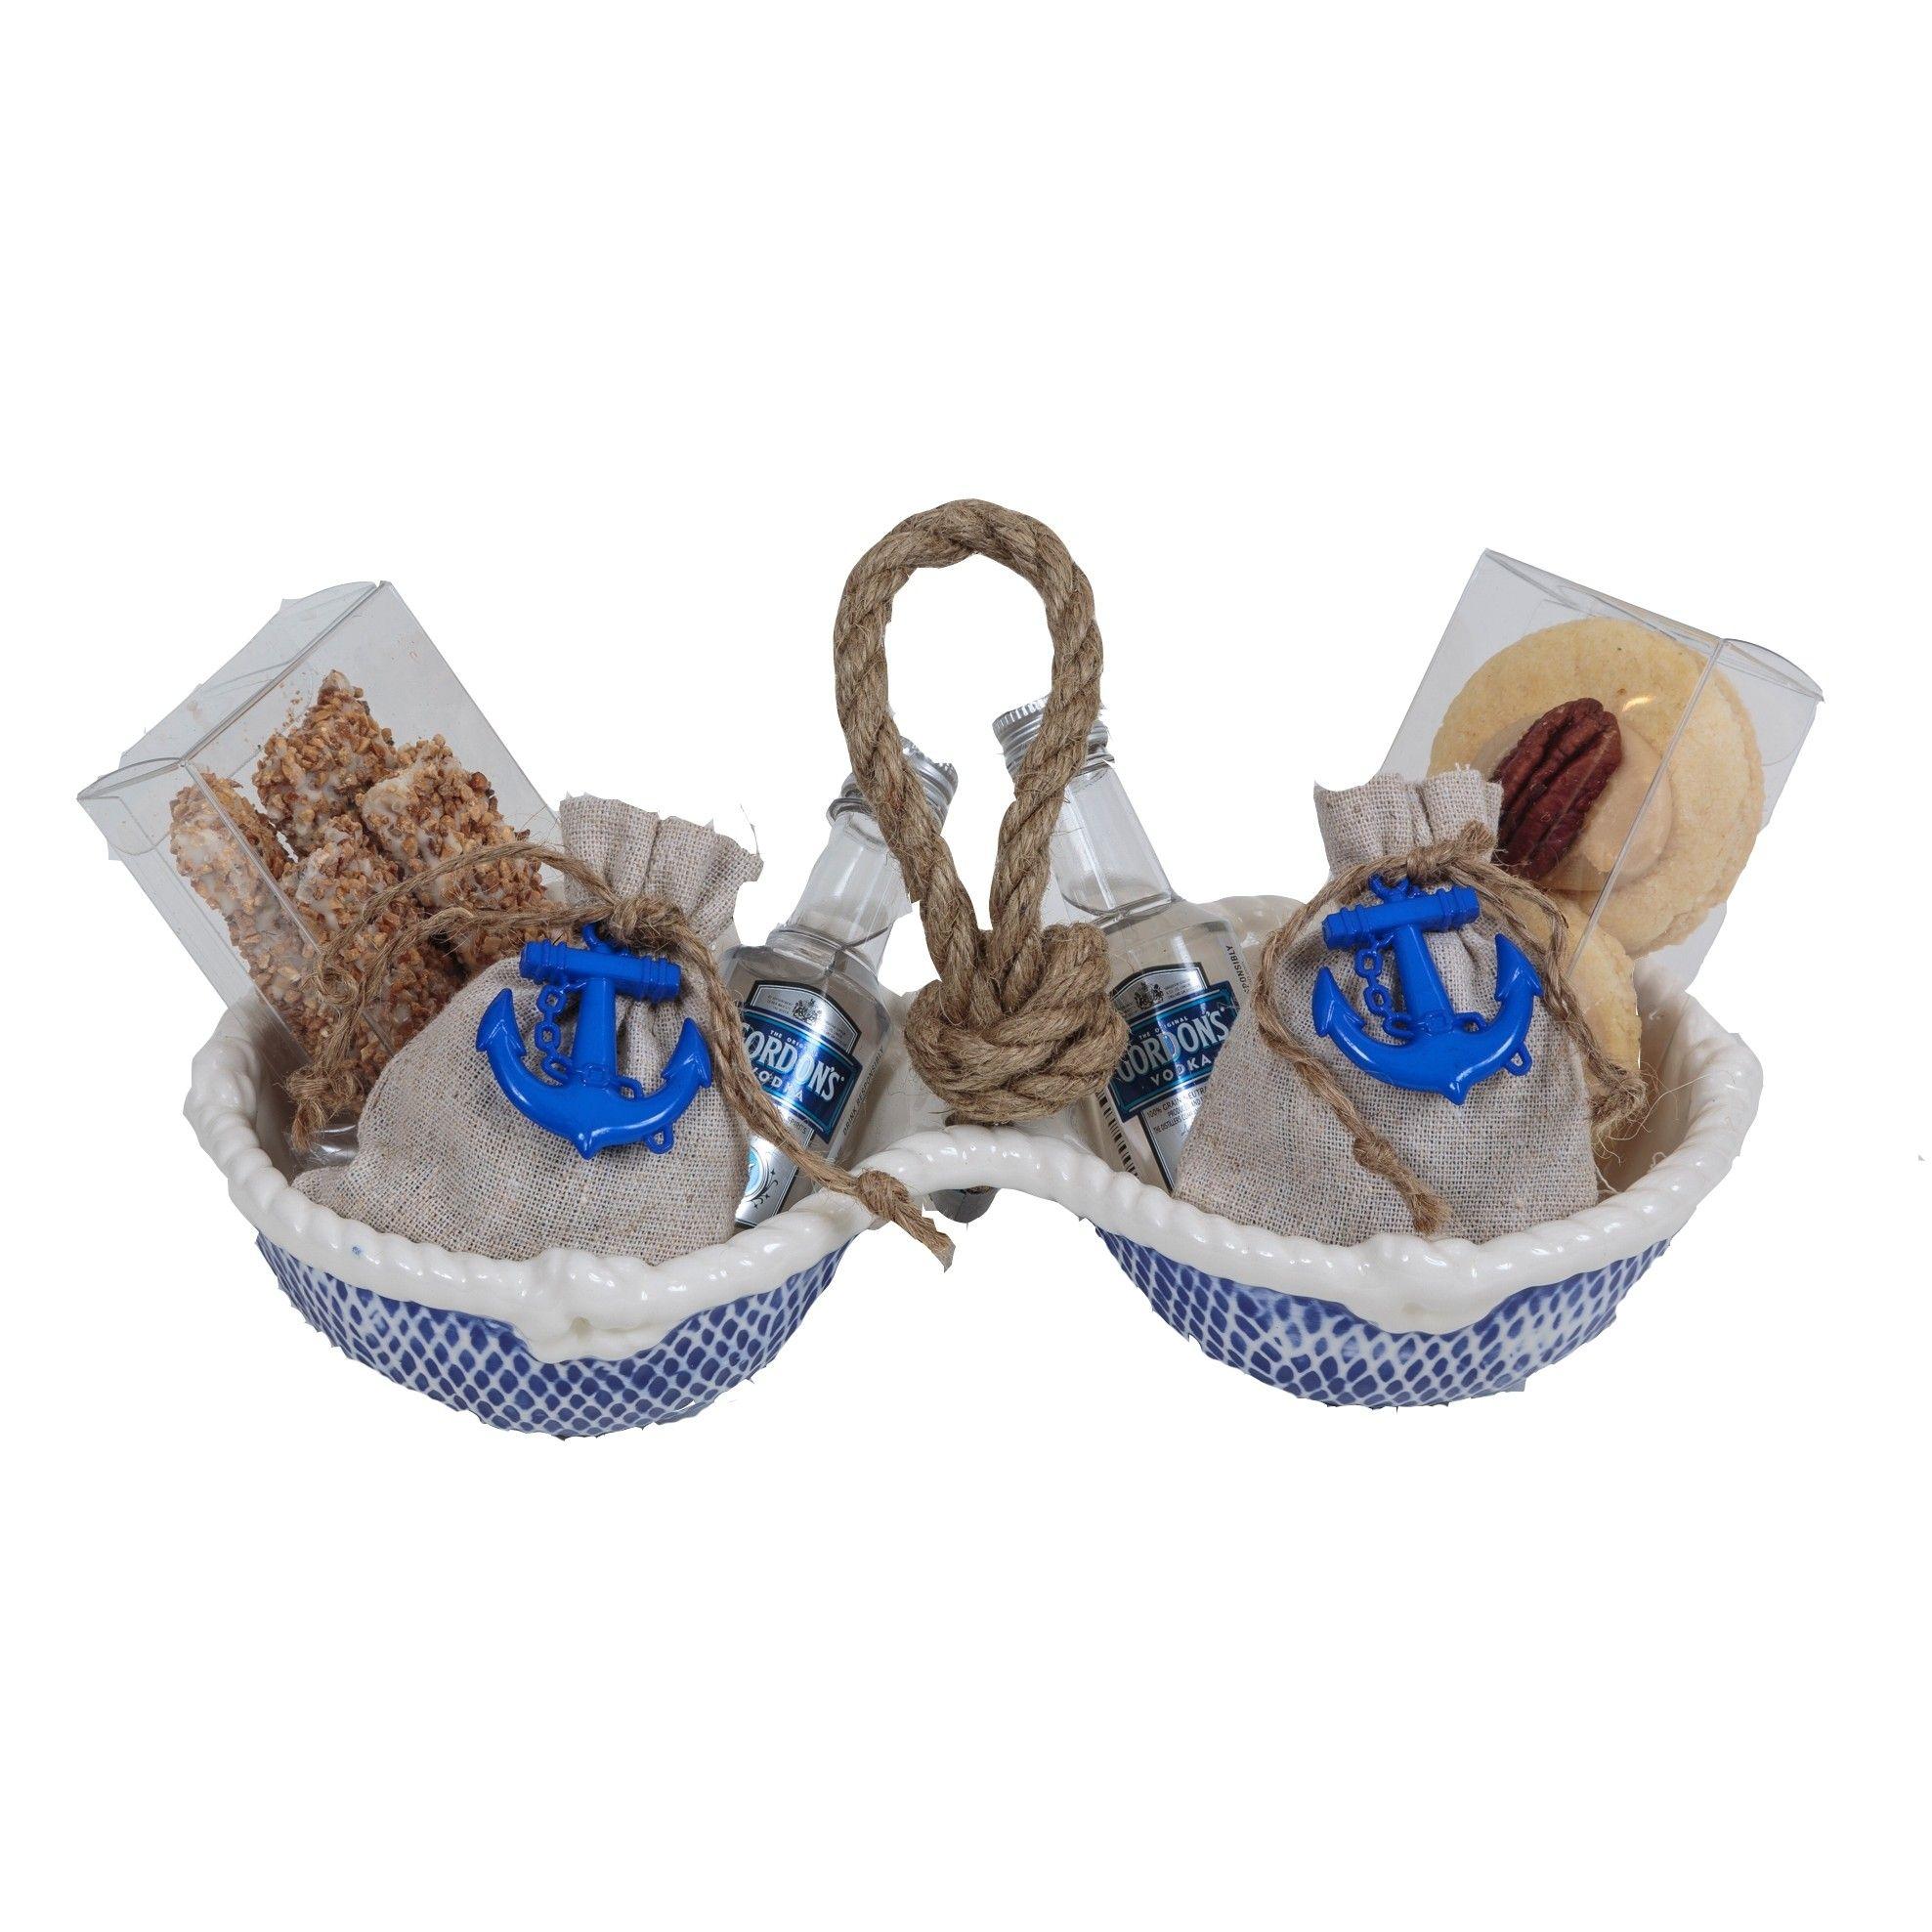 Cruise Gifts Basket, Cruise